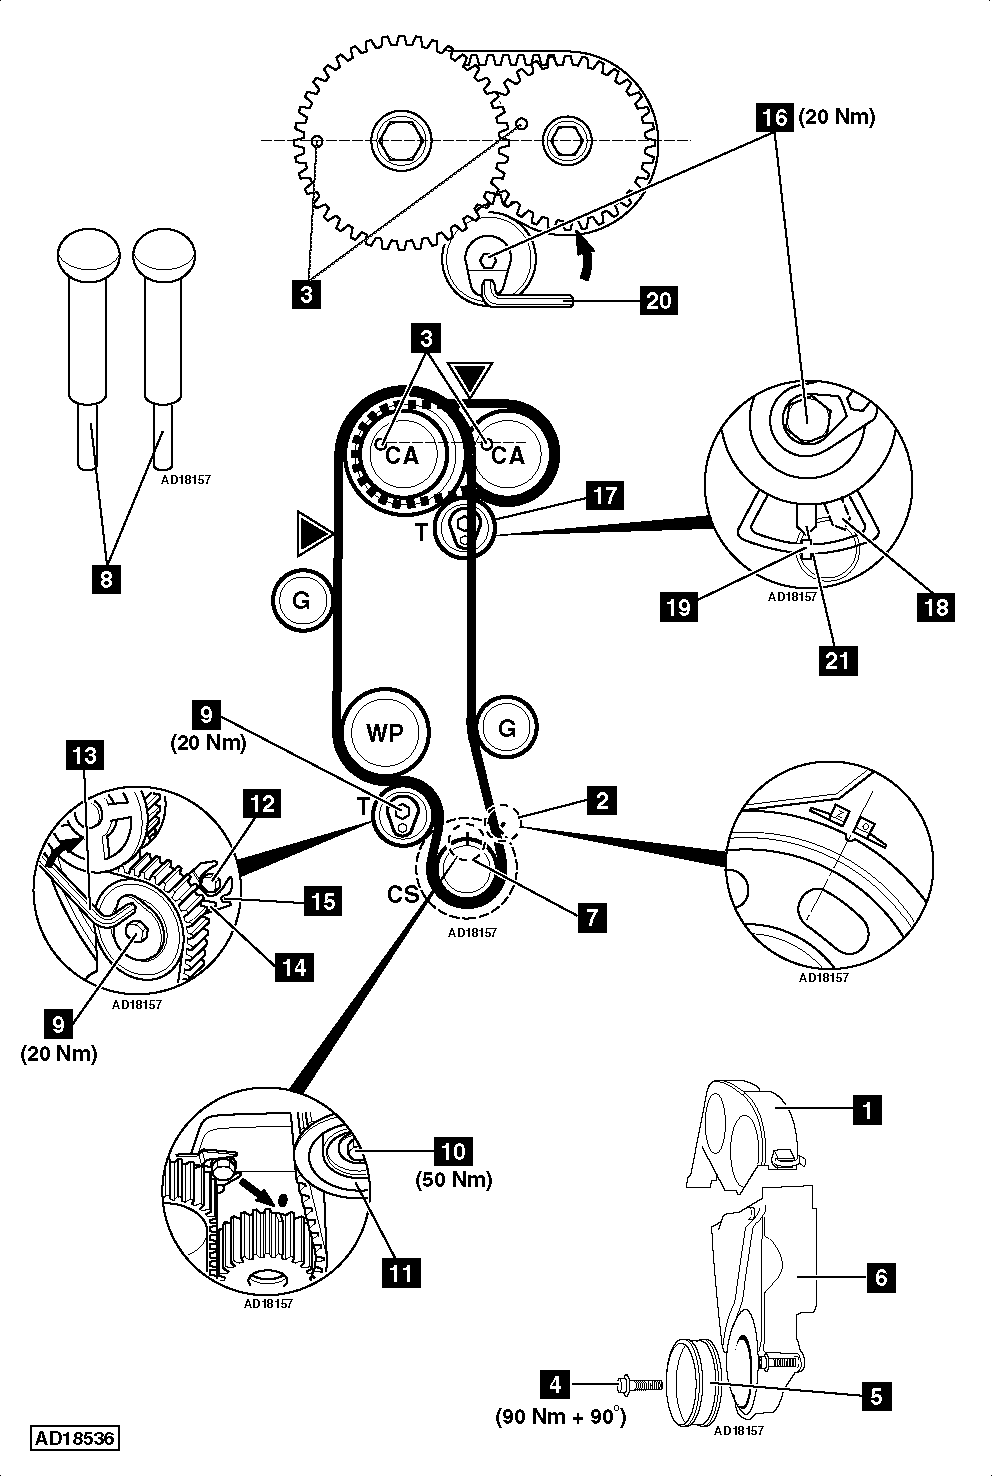 [FZ_5207] Kia Sorento Belts Diagram Schematic Wiring